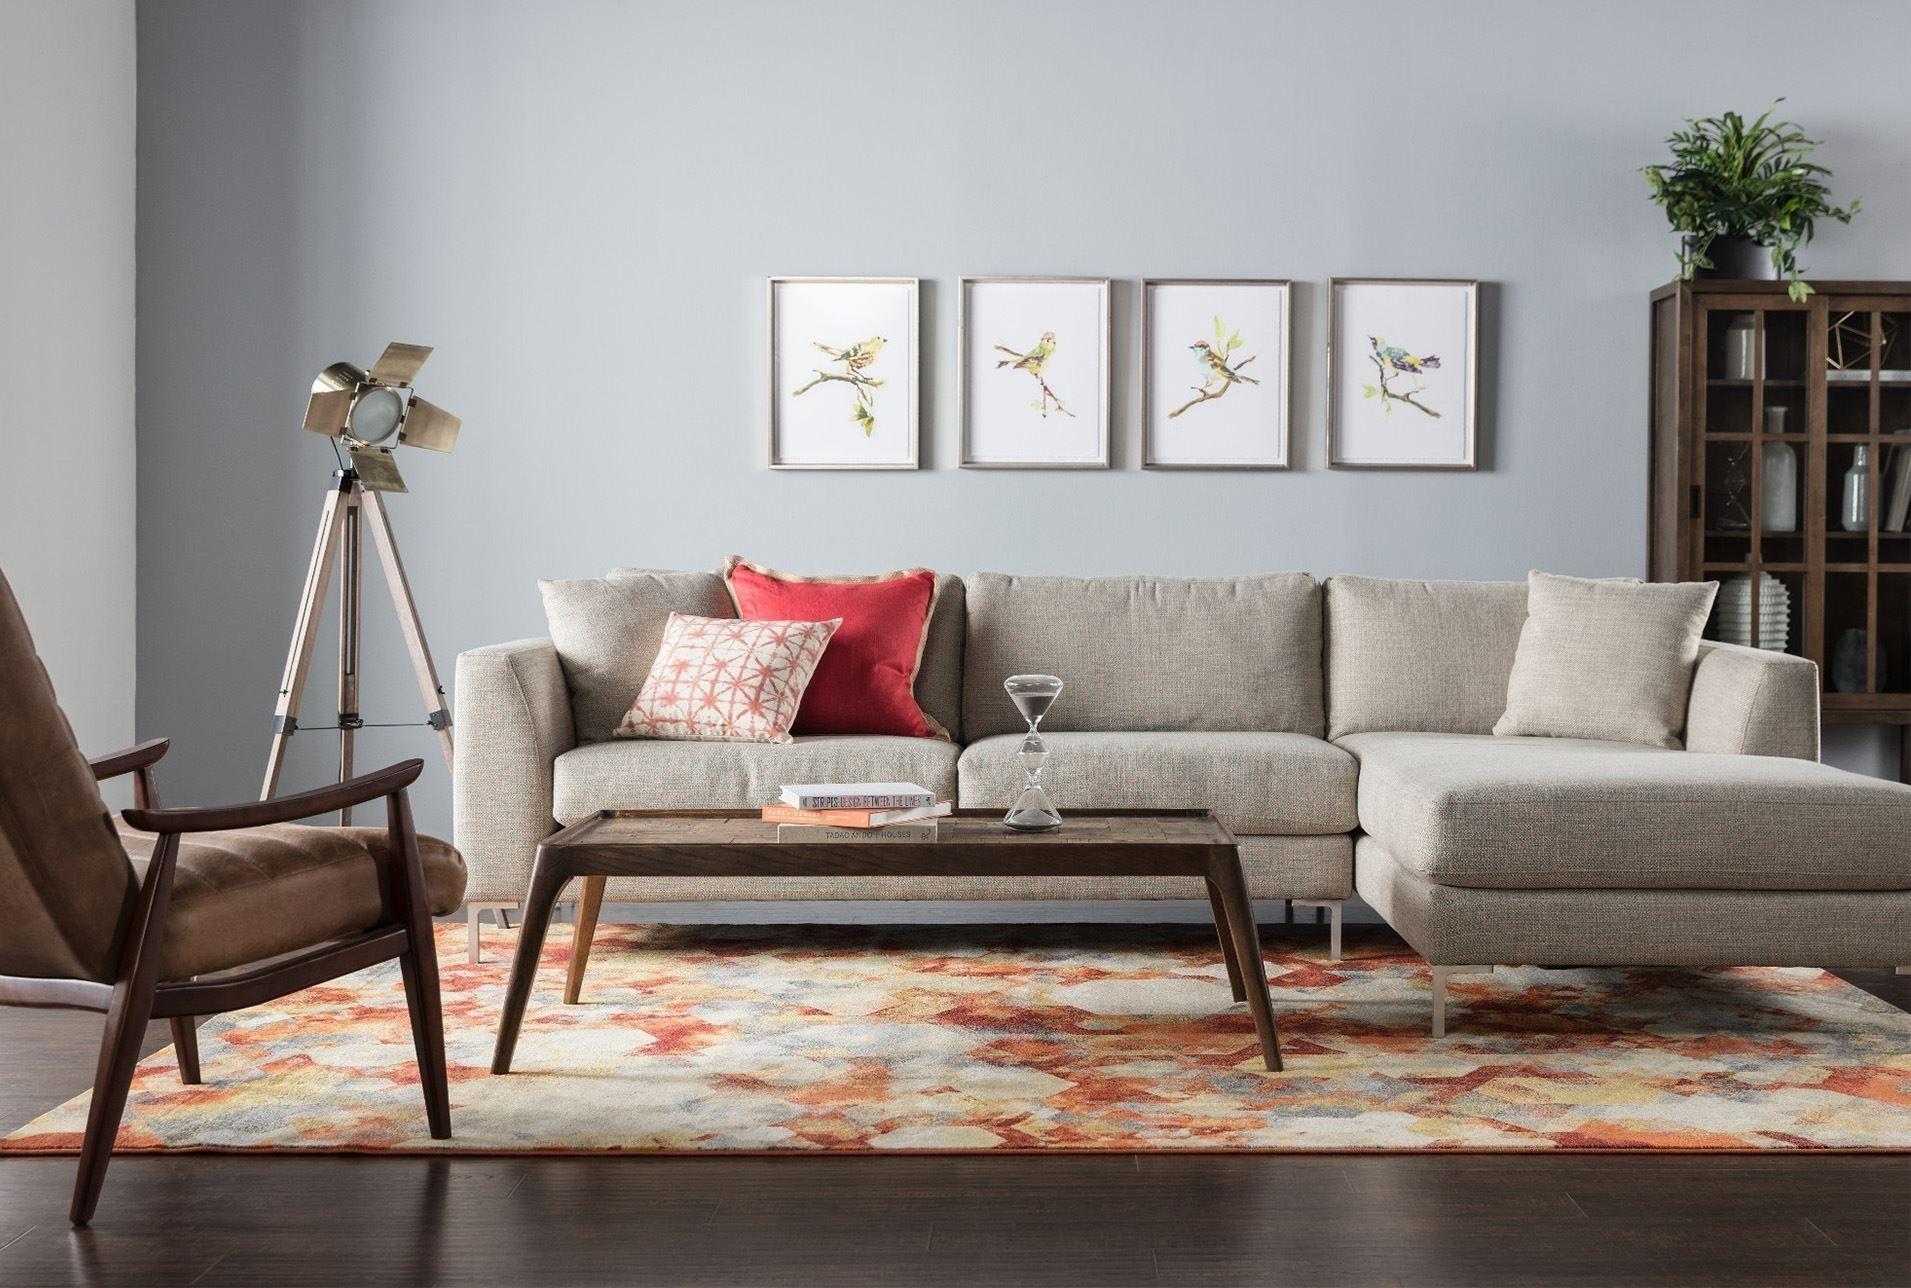 Stella 2 Piece Condo Sectional W/raf Chaise | Living Room With Regard To Aquarius Dark Grey 2 Piece Sectionals With Raf Chaise (View 15 of 25)